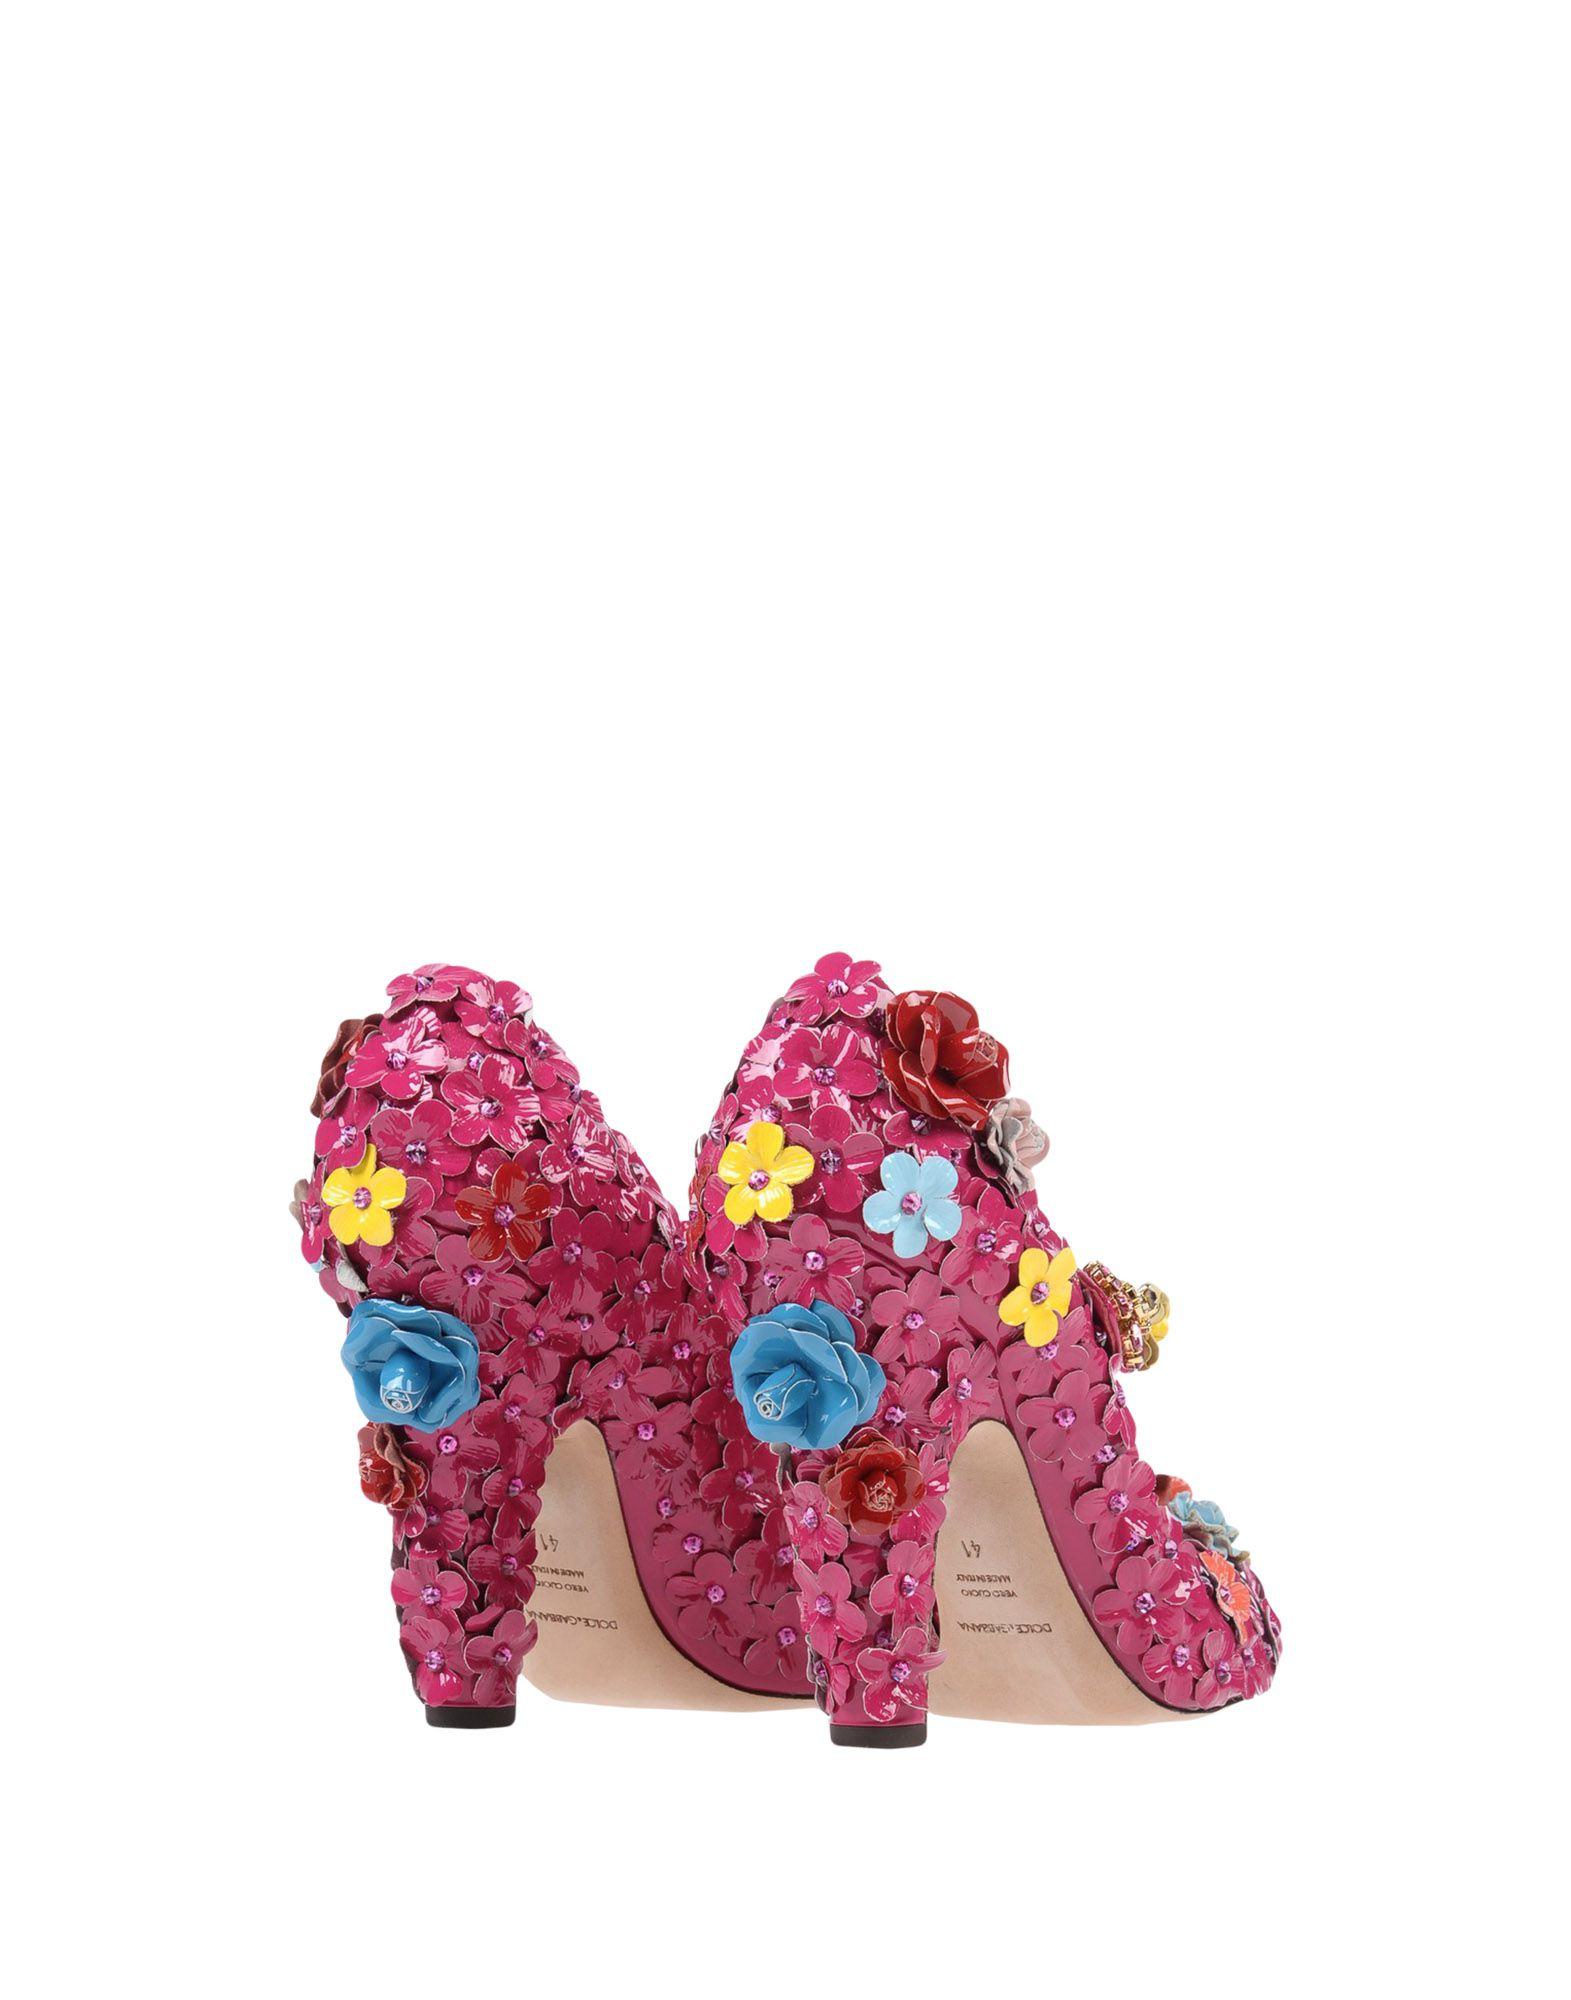 Dolce & Gabbana Pumps Schuhe Damen  11487831KQ Neue Schuhe Pumps 8e96a8